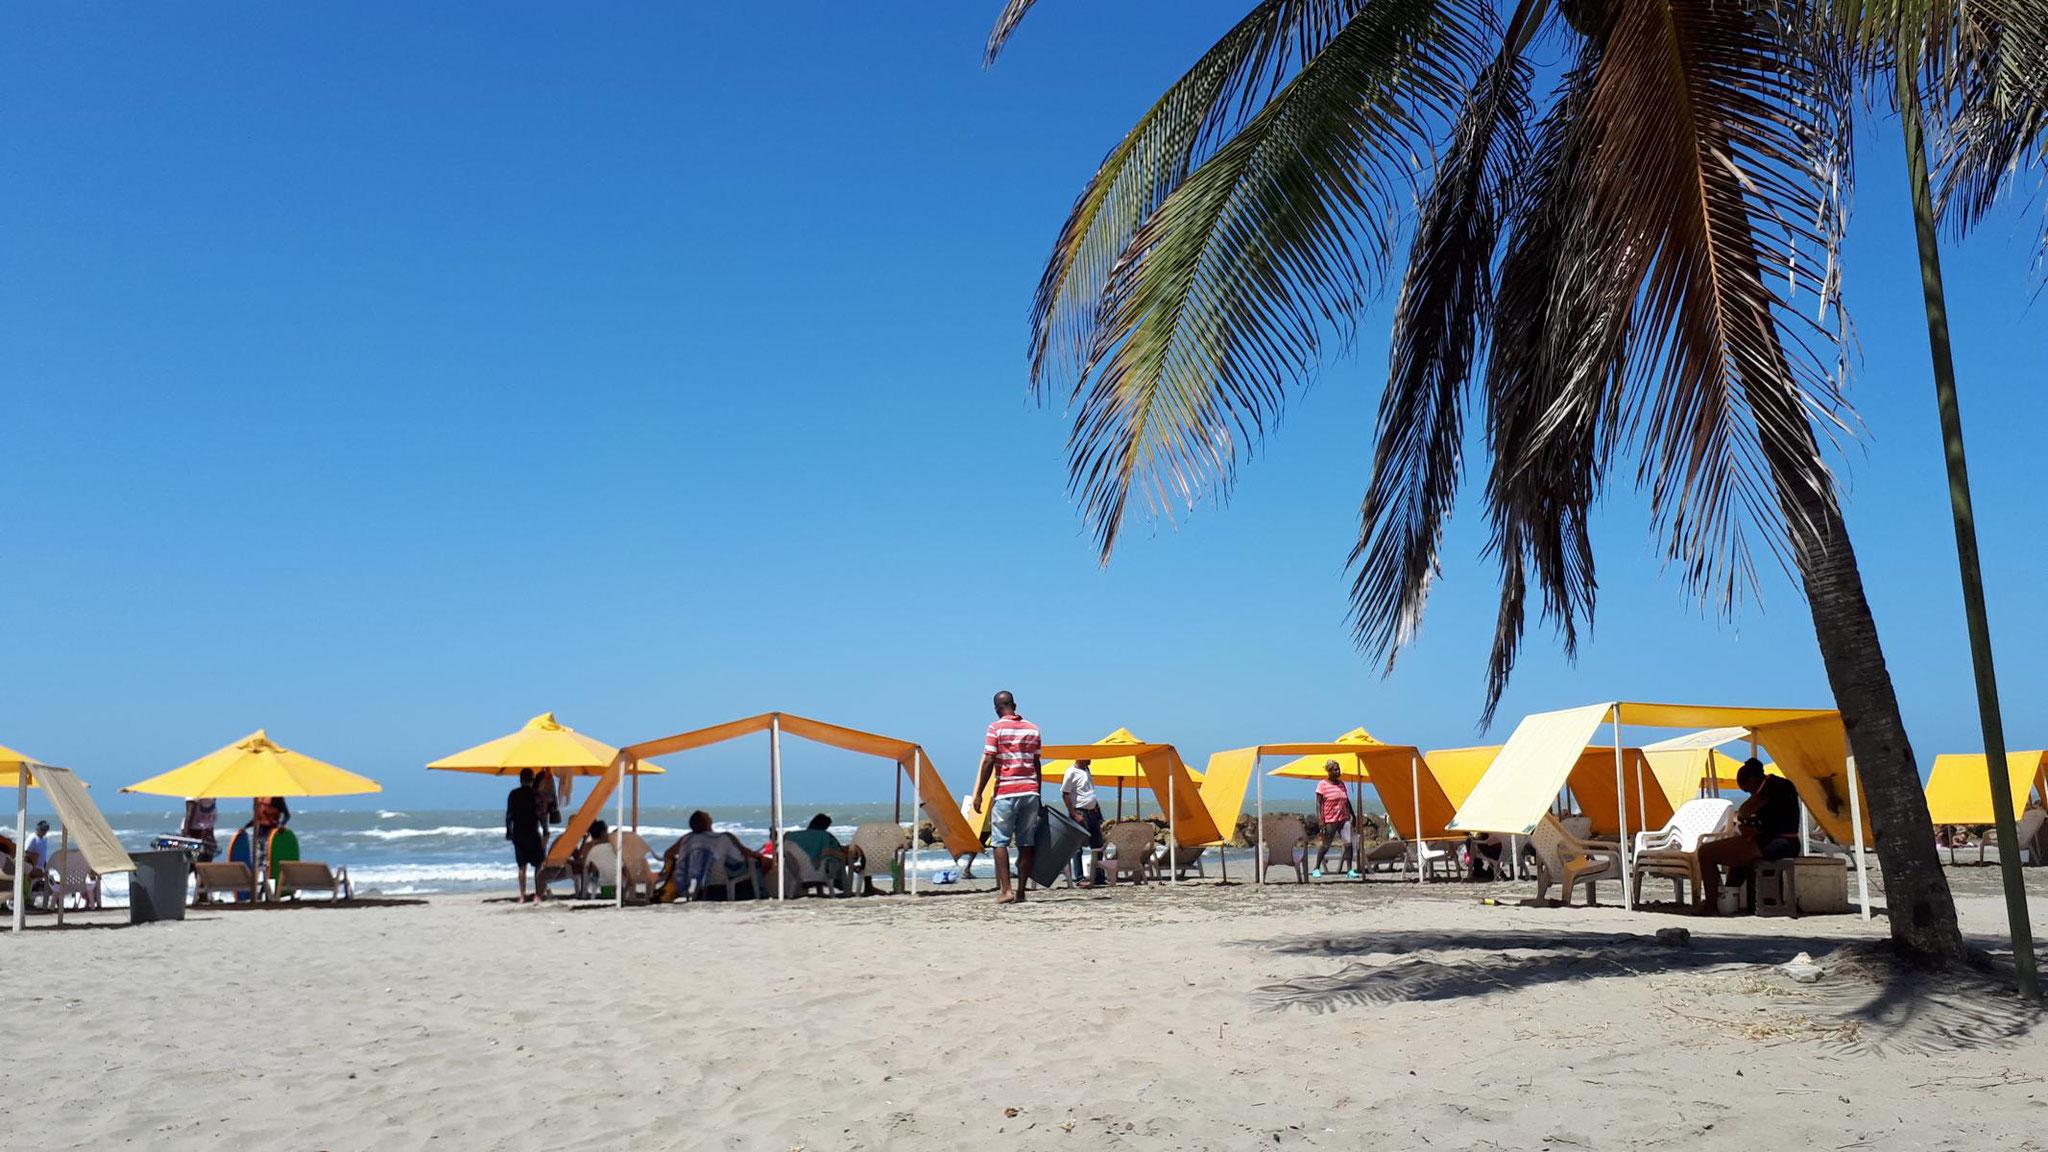 Strand auf Bocagrande